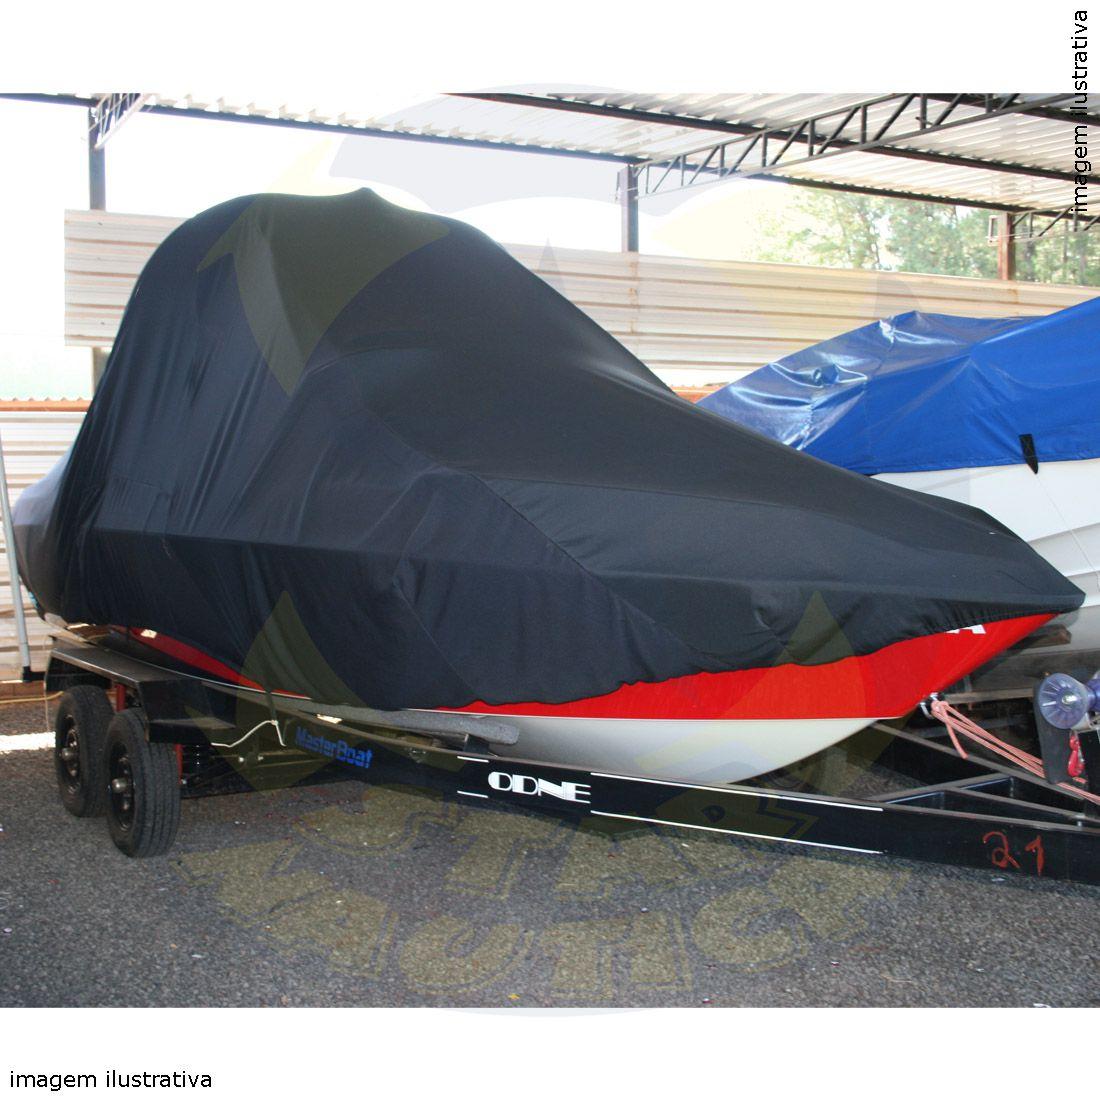 Capa Lona de Cobertura Lancha FS 230 Sirena com Targa Lona Emborrachada